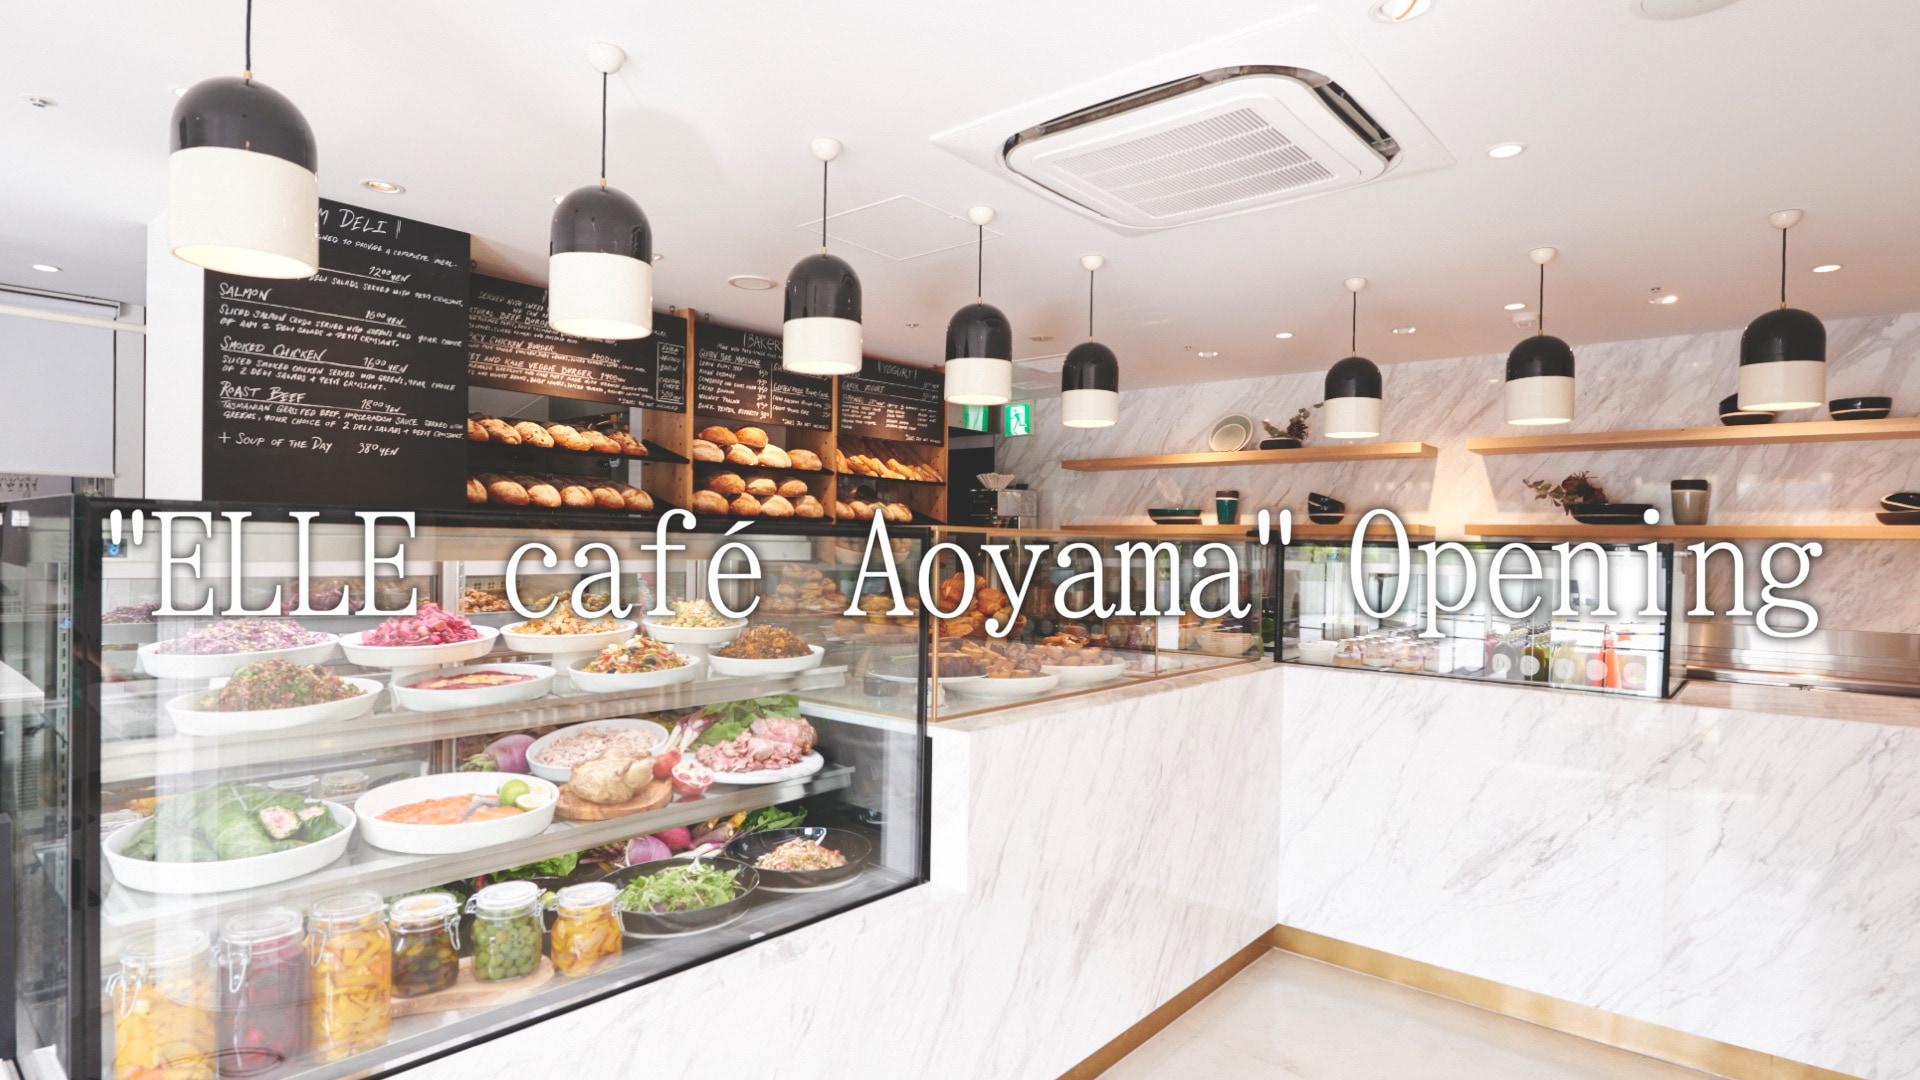 ELLE café Aoyamaオープン!Lou Doillon(ルー・ドワイヨン)special interview